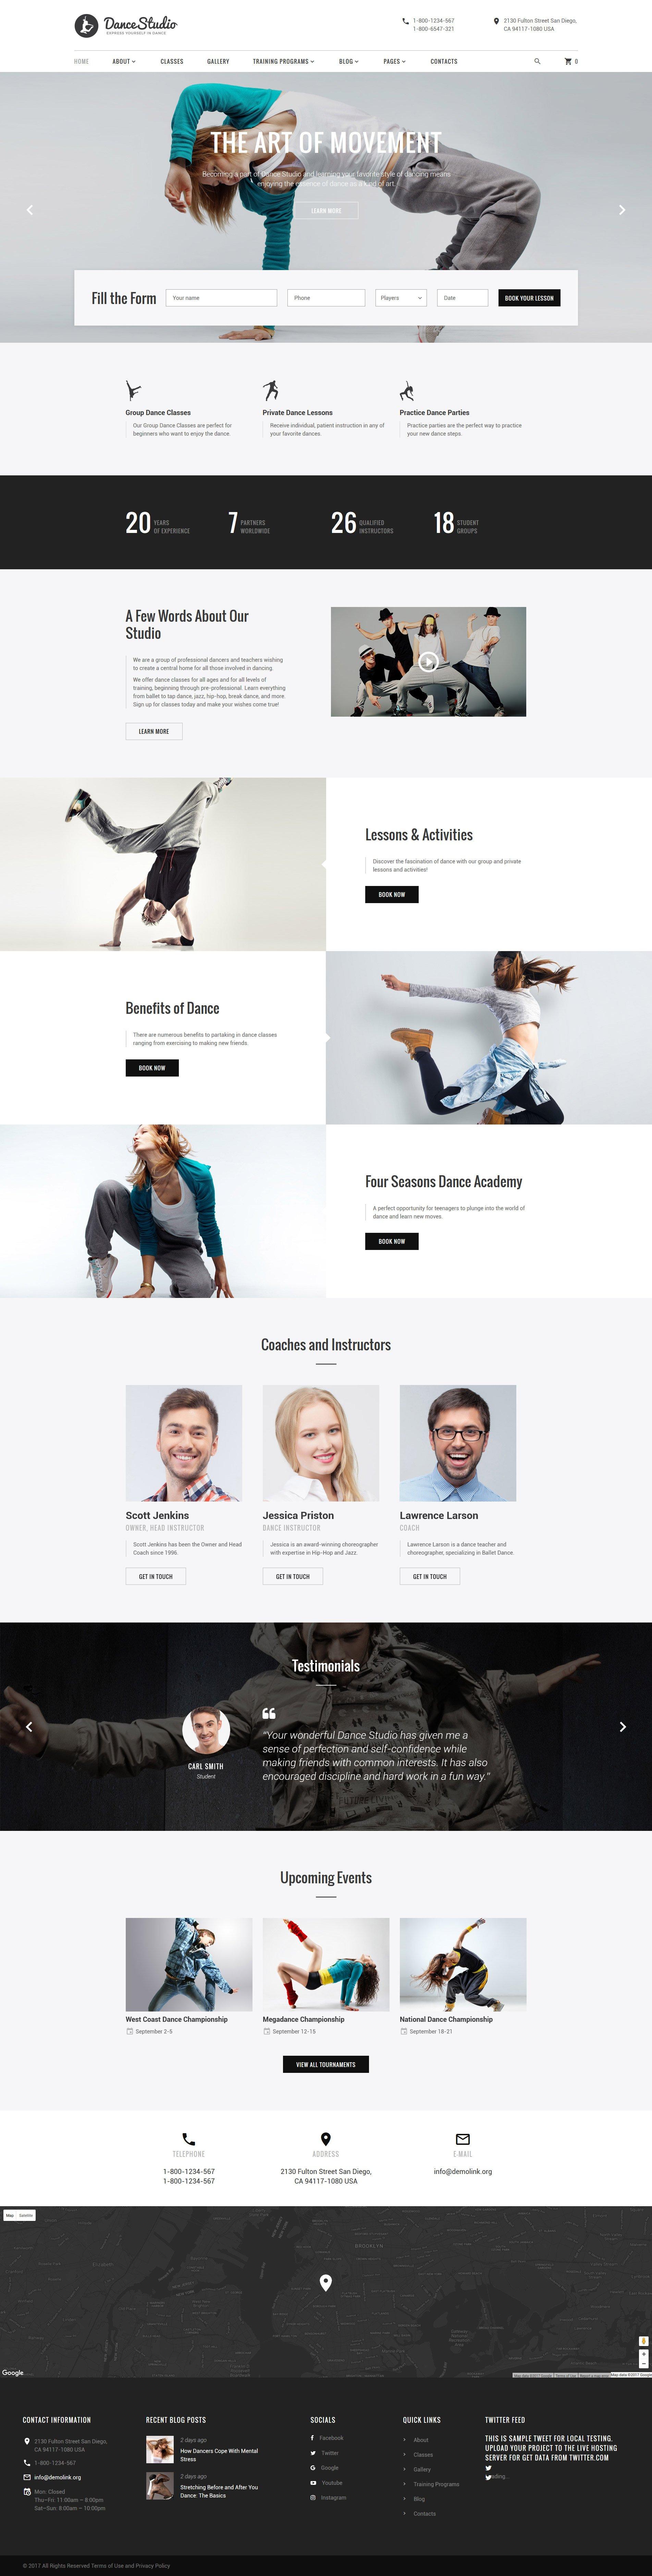 DanceStudio - Dance Coach Responsive Website Template - screenshot